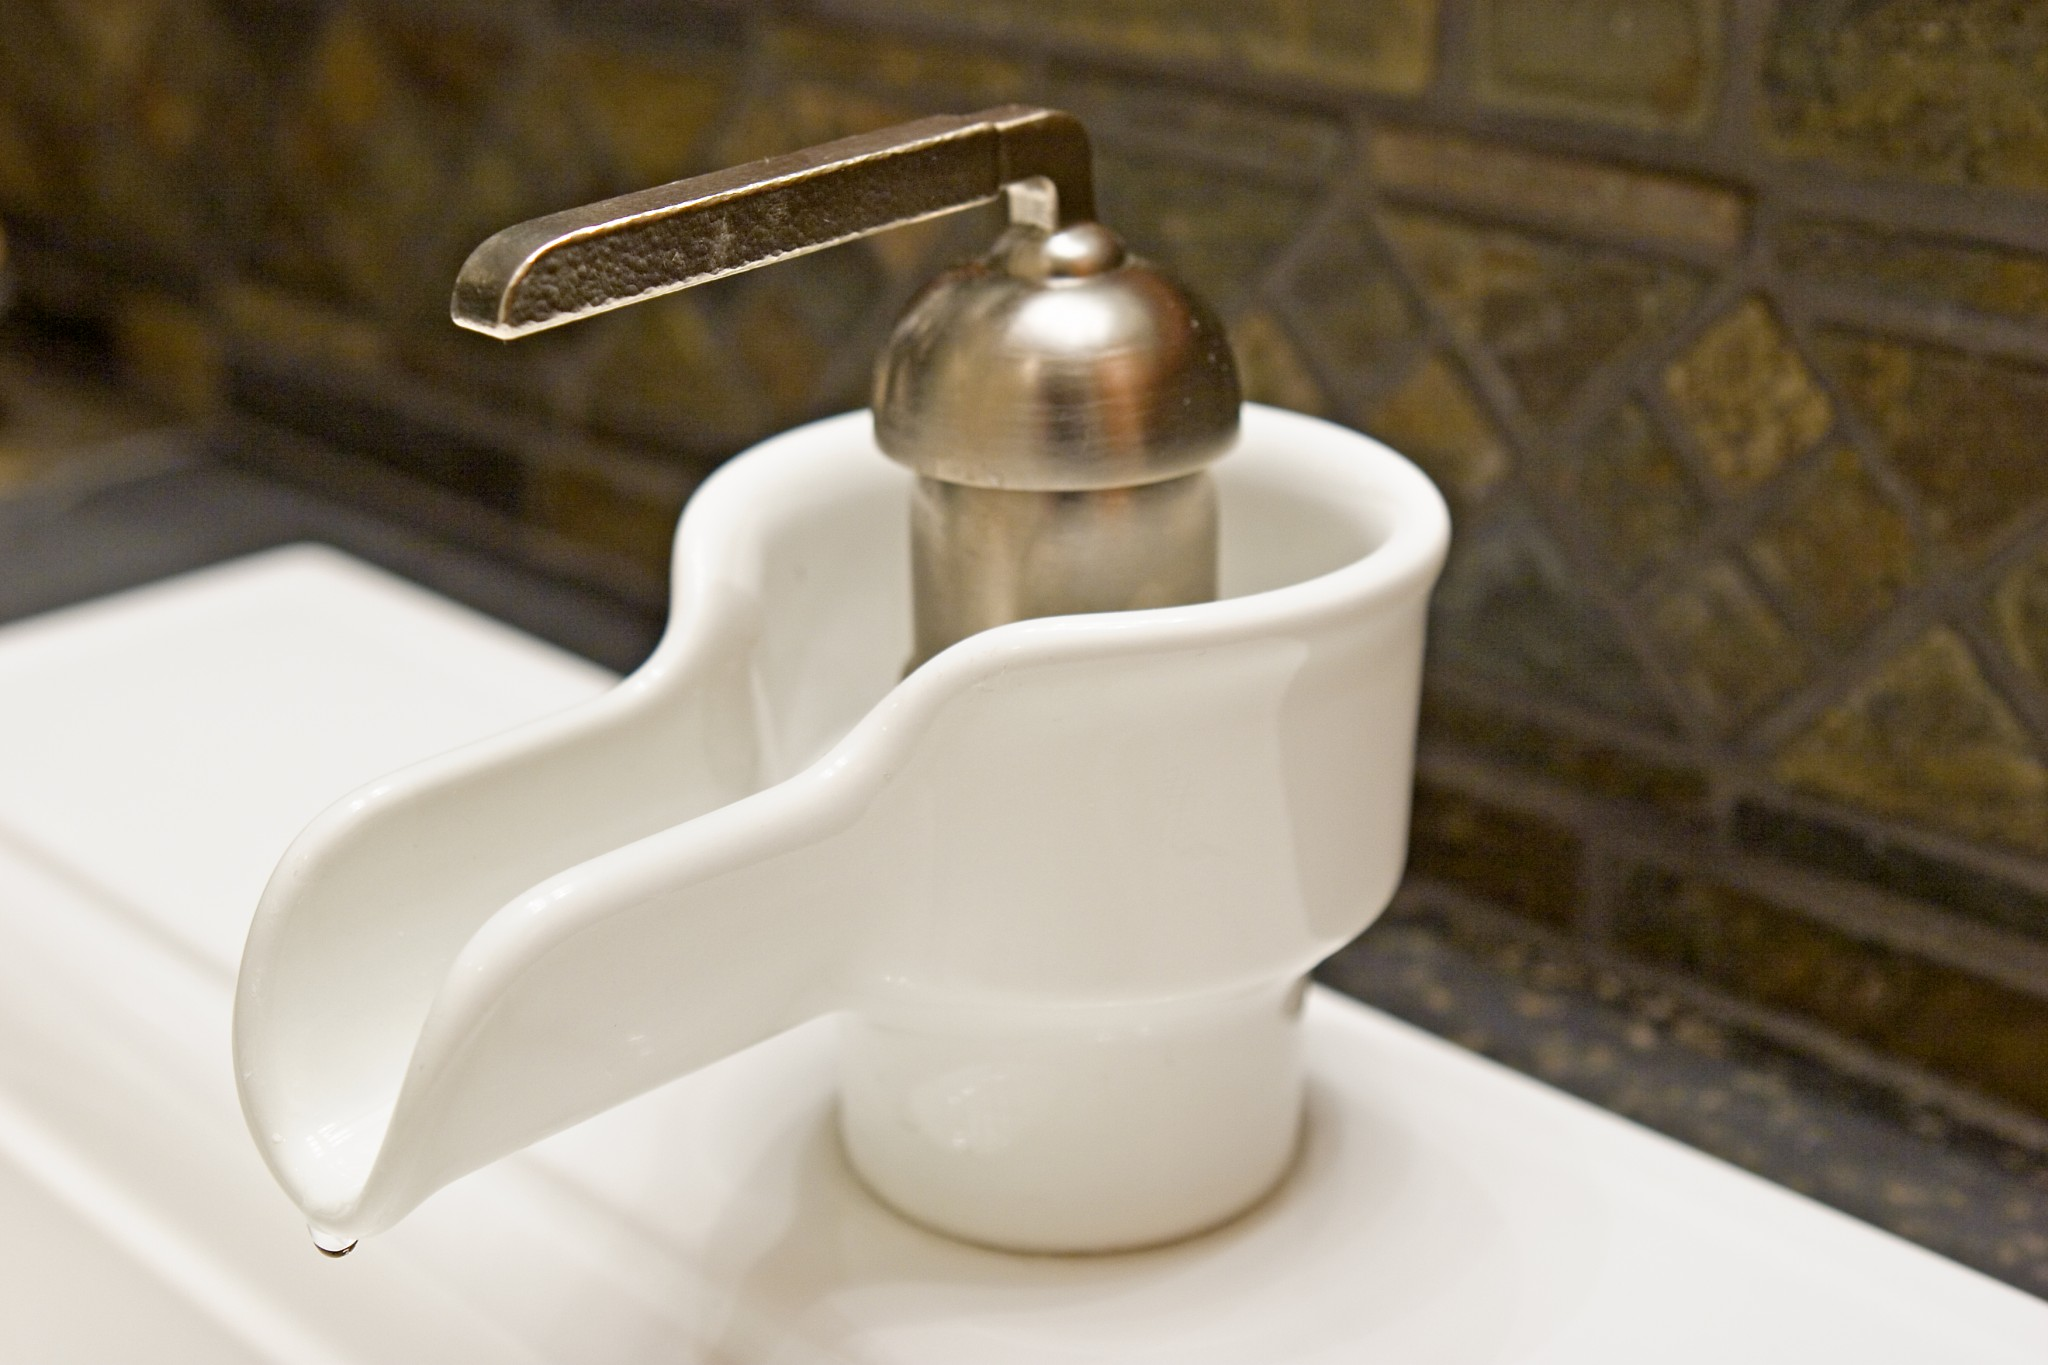 Bathrooms | M.R. Construction | Tacoma, WA